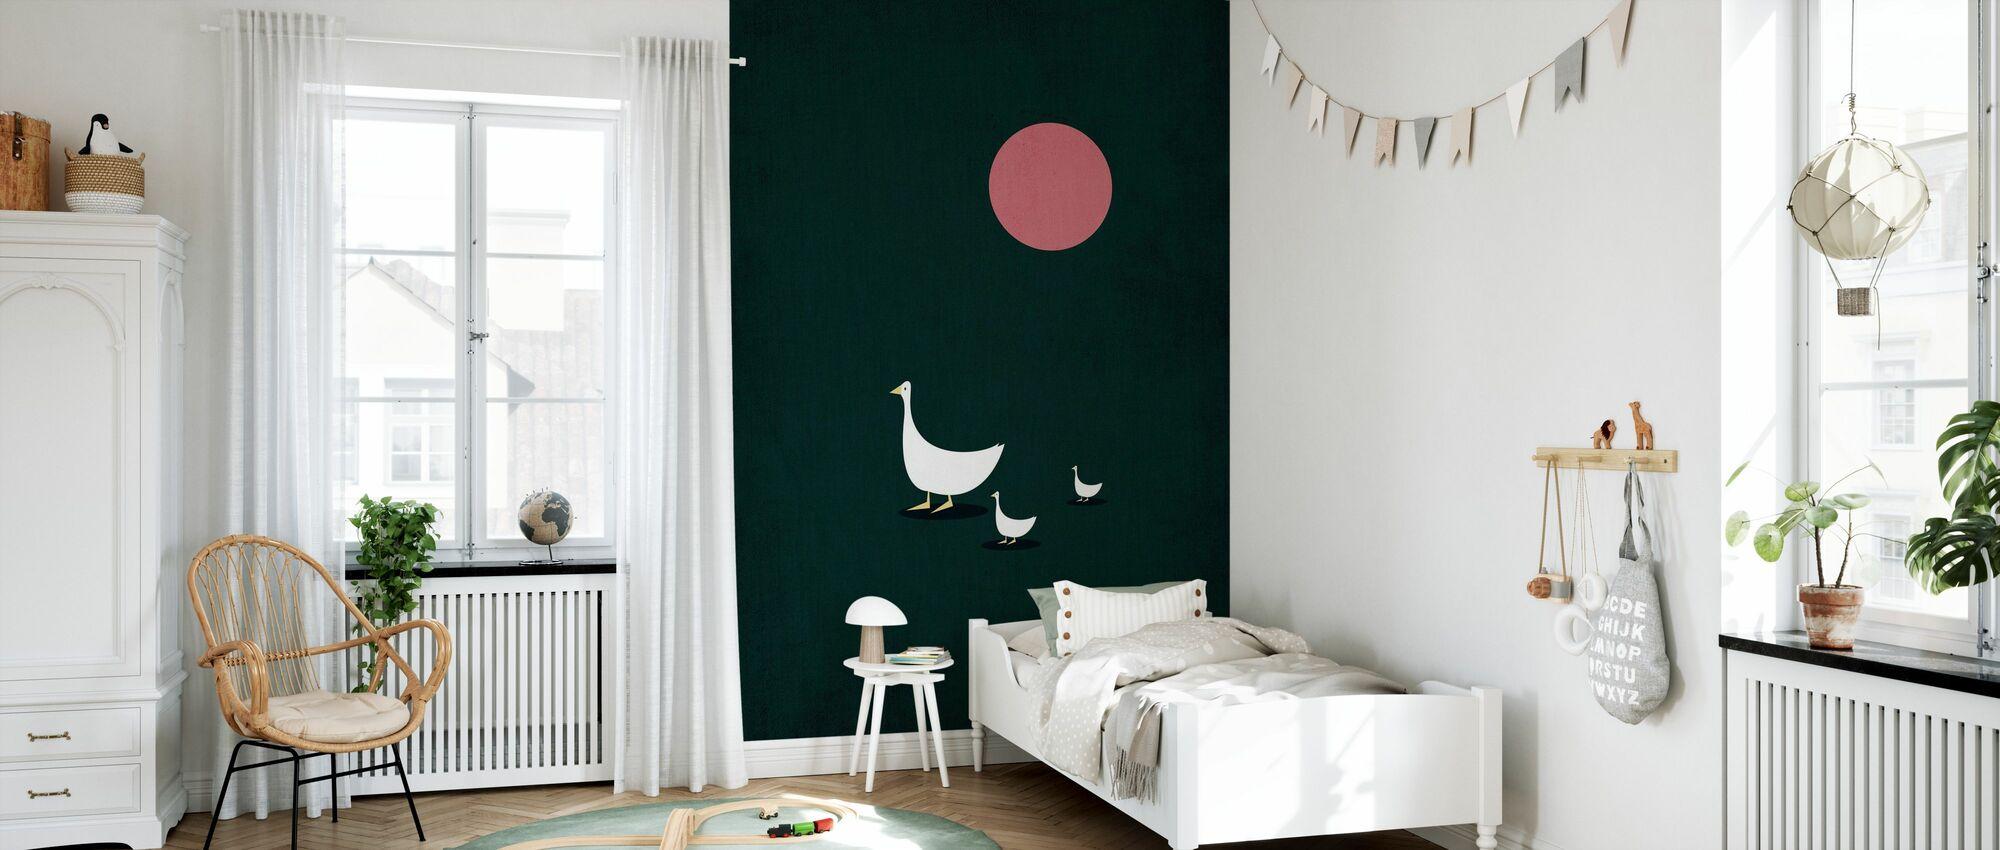 Sunny Side of Life - Wallpaper - Kids Room